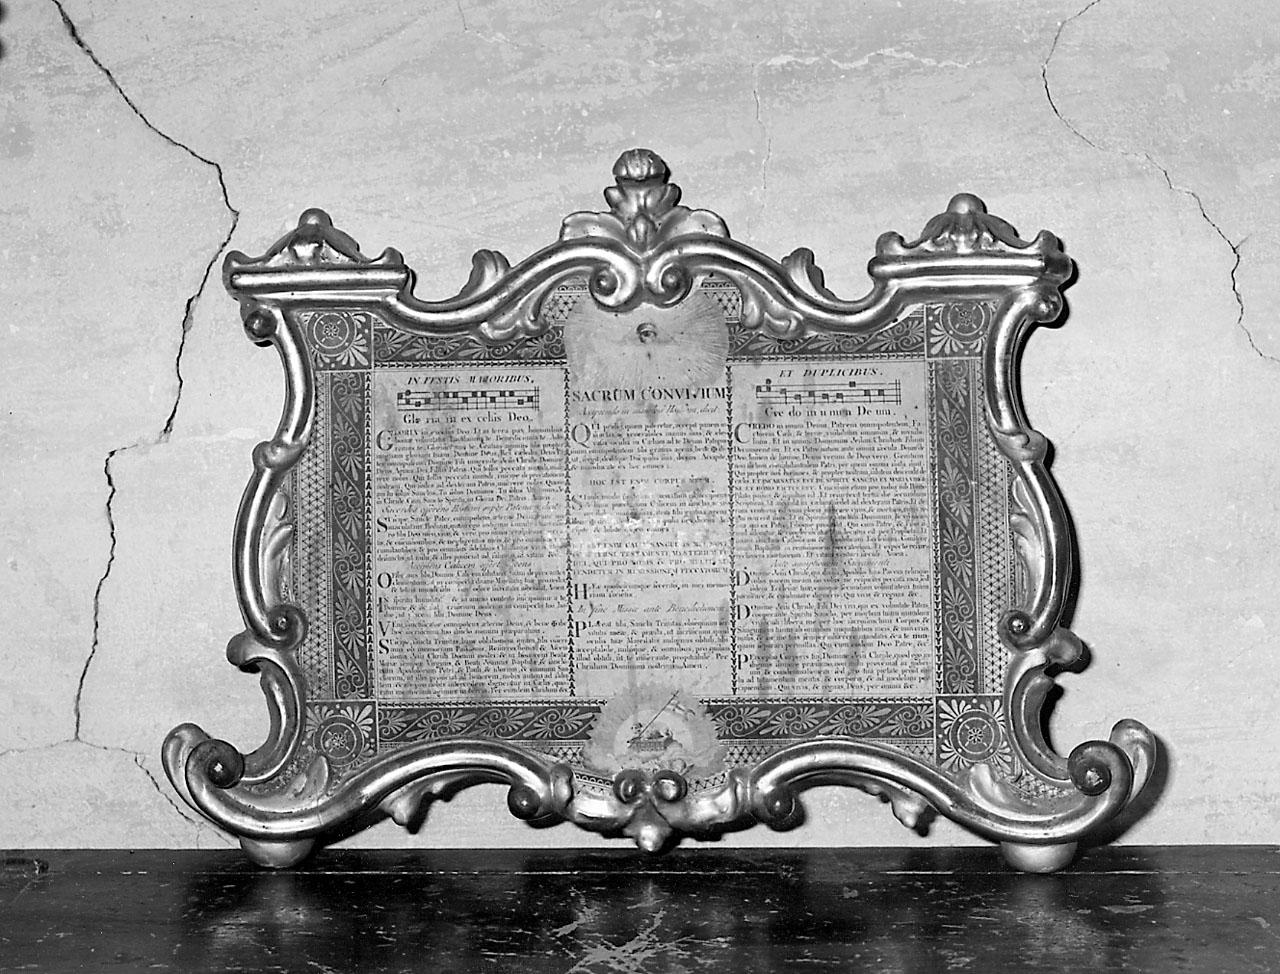 cartagloria - produzione toscana (sec. XVIII)